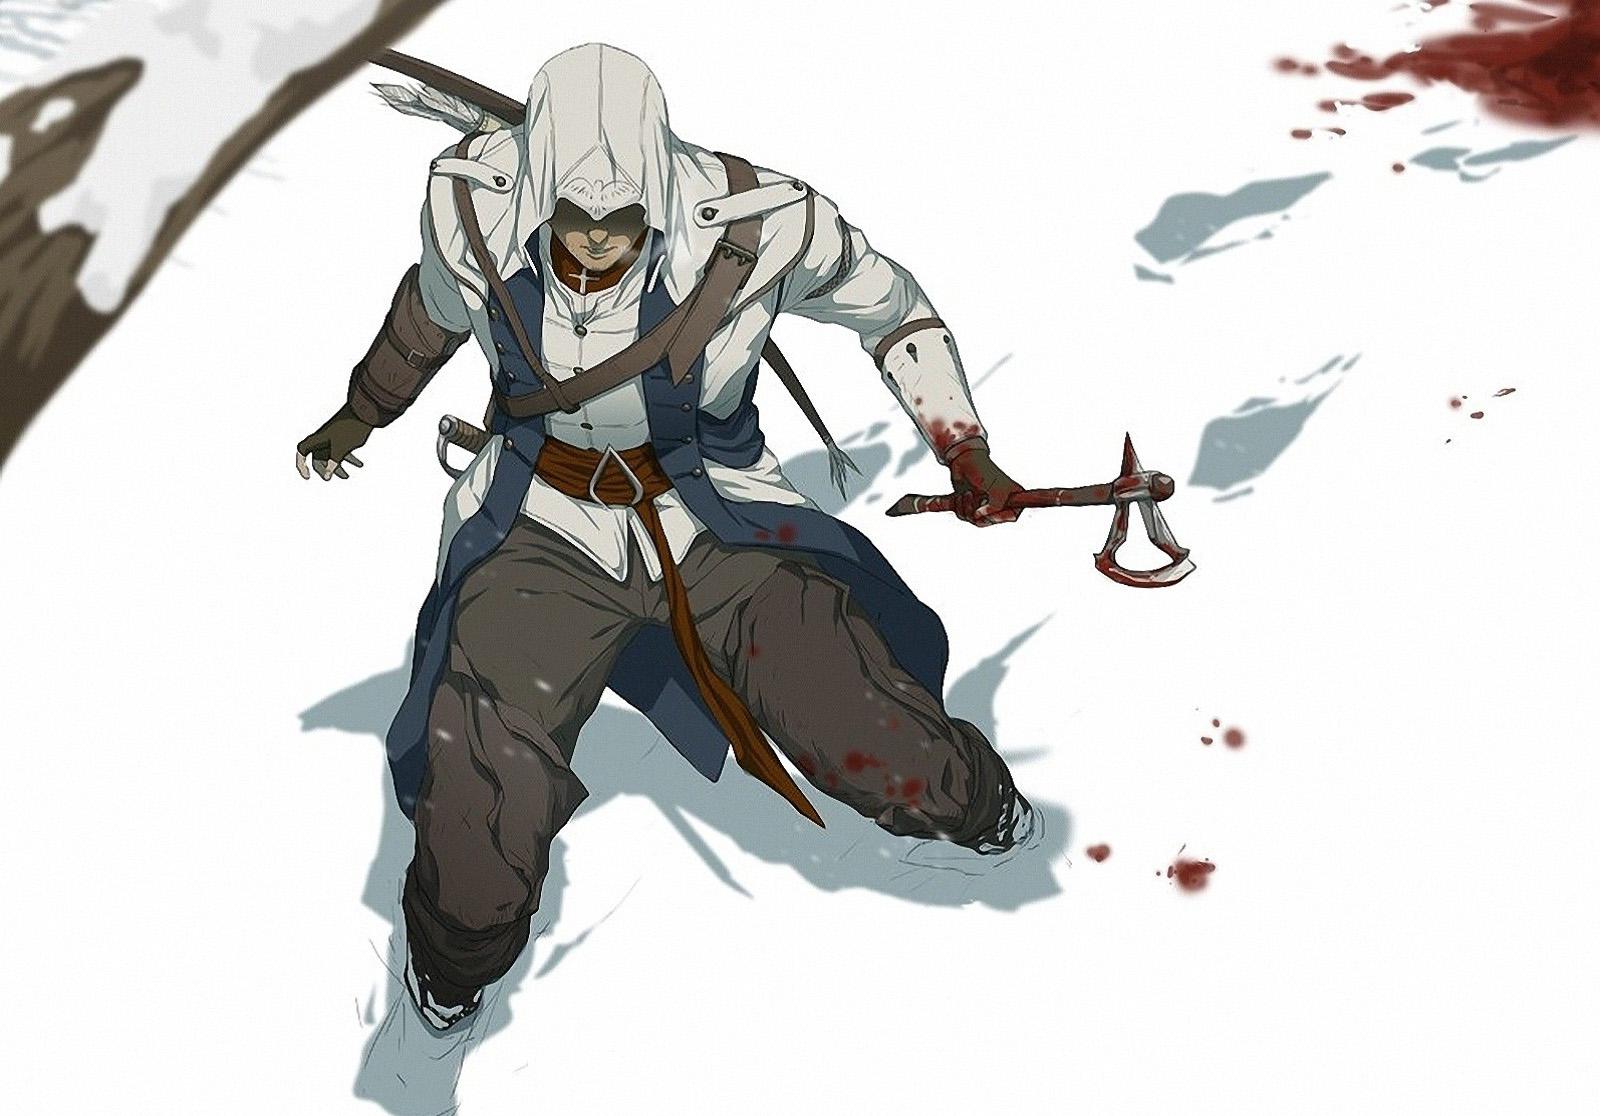 Tapety 1600x1116 Px Anime Fotky Umeleckych Obrazu Charaktery